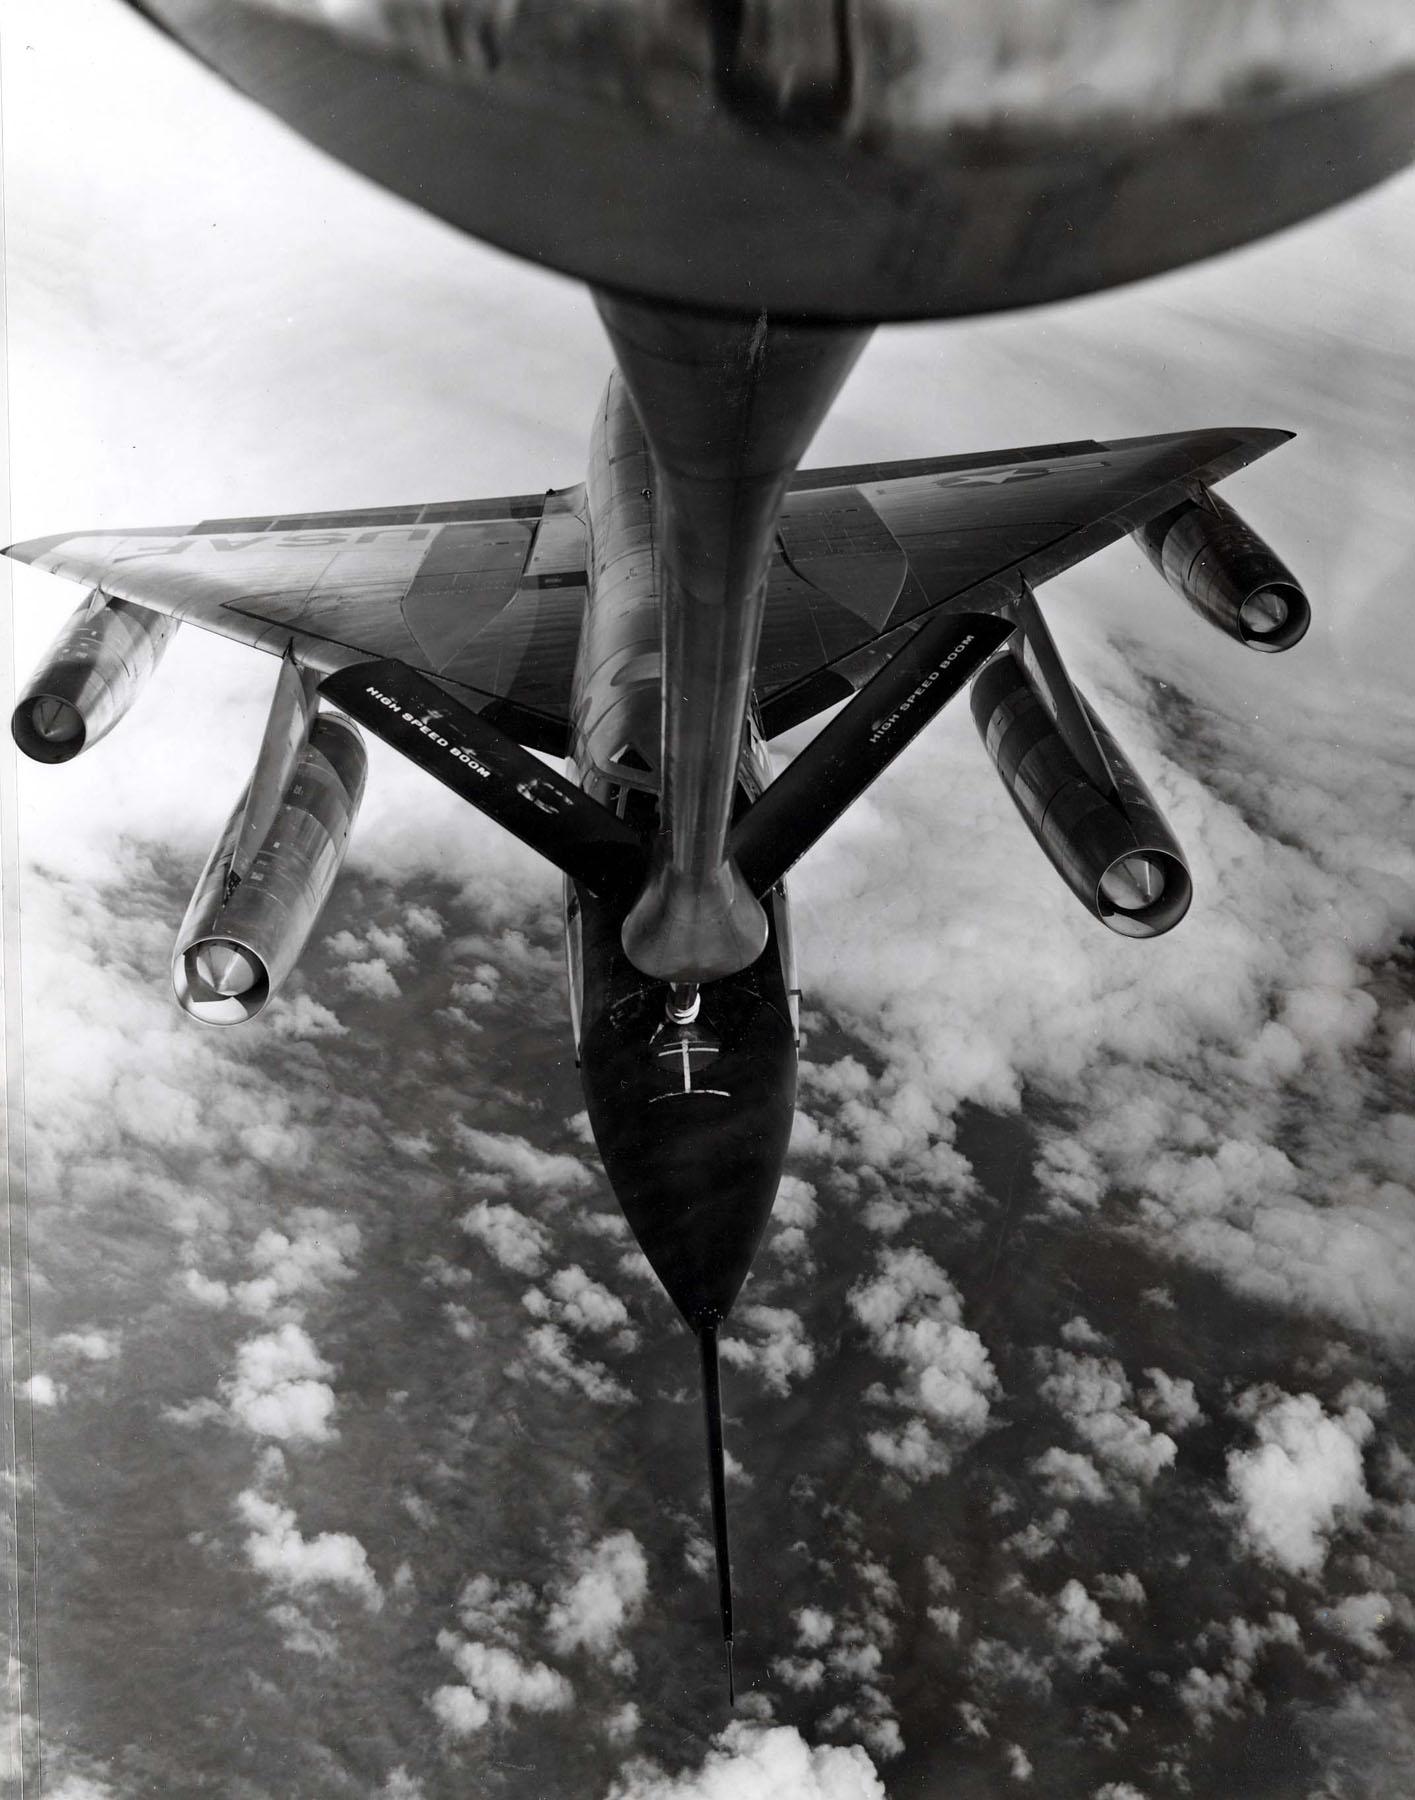 aviation history, B-58, Hustler, Lockheed, on this day, World Record